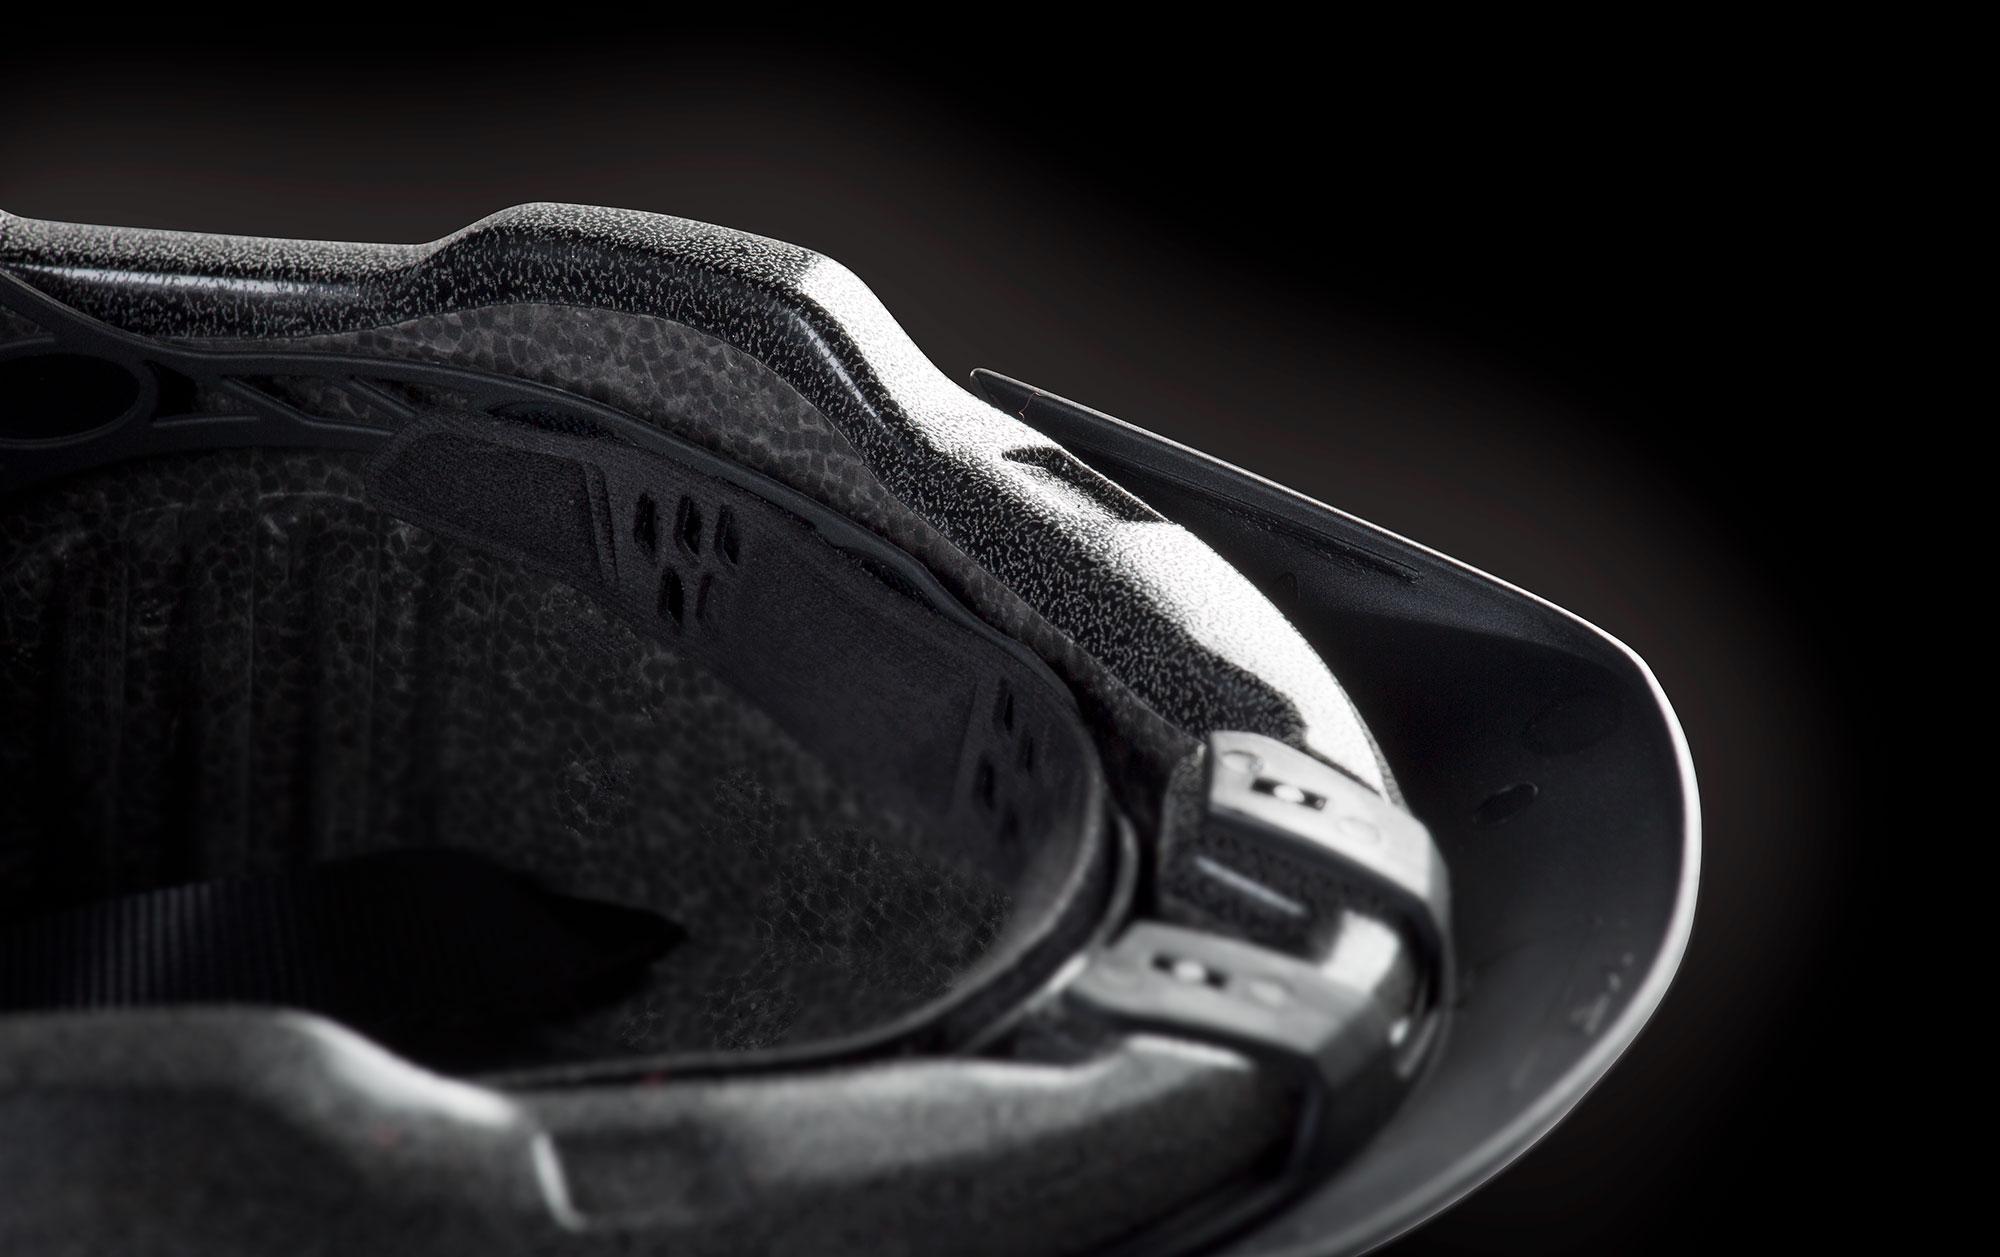 MET Grancorso Urban, E-bike and Commuting Helmet Full wrap shell